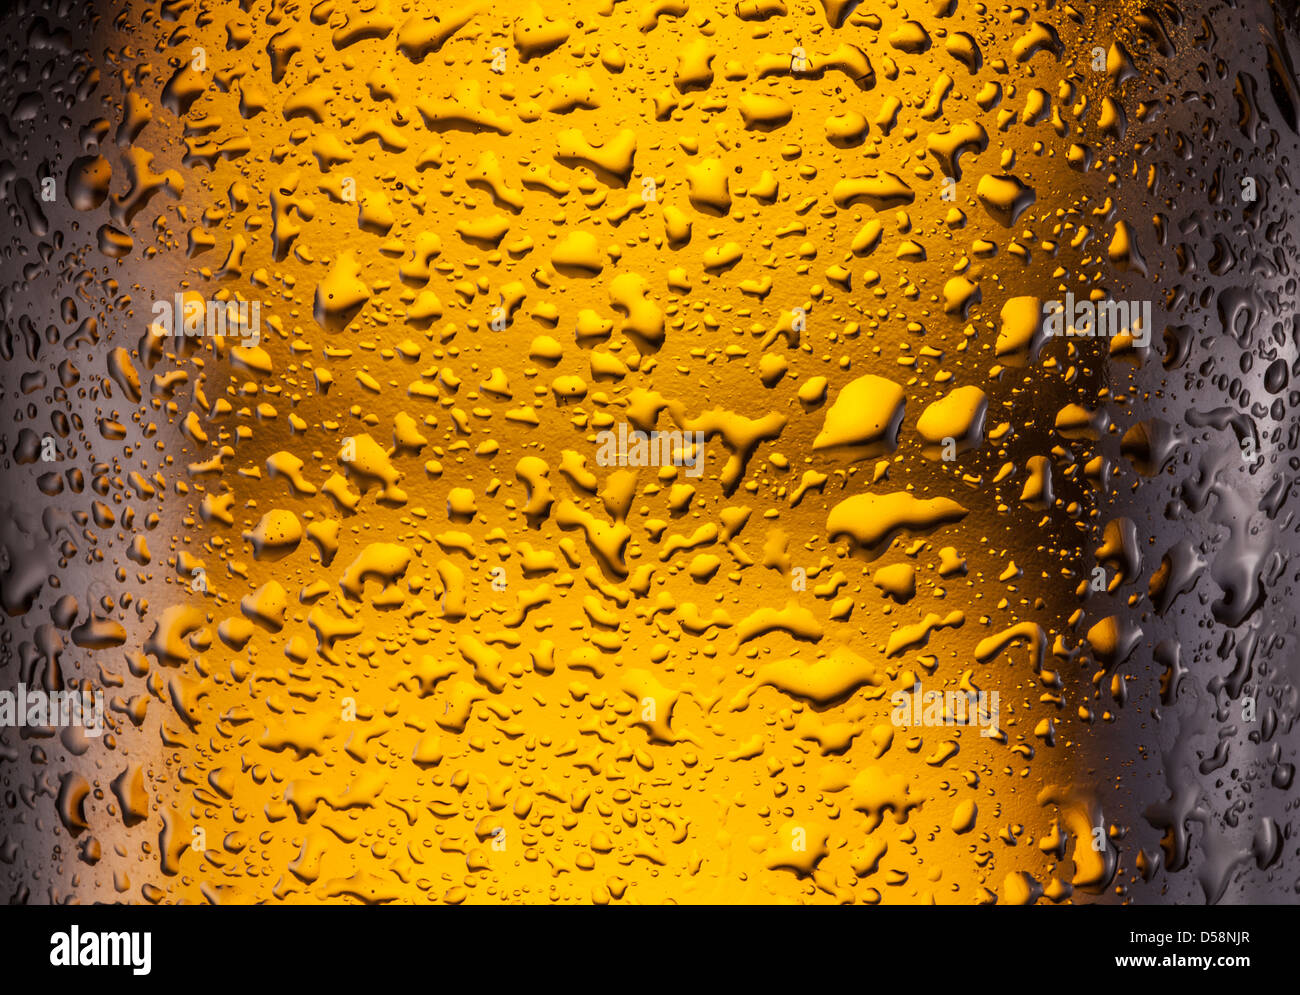 Сlose shot of drops on a bottle beer. - Stock Image